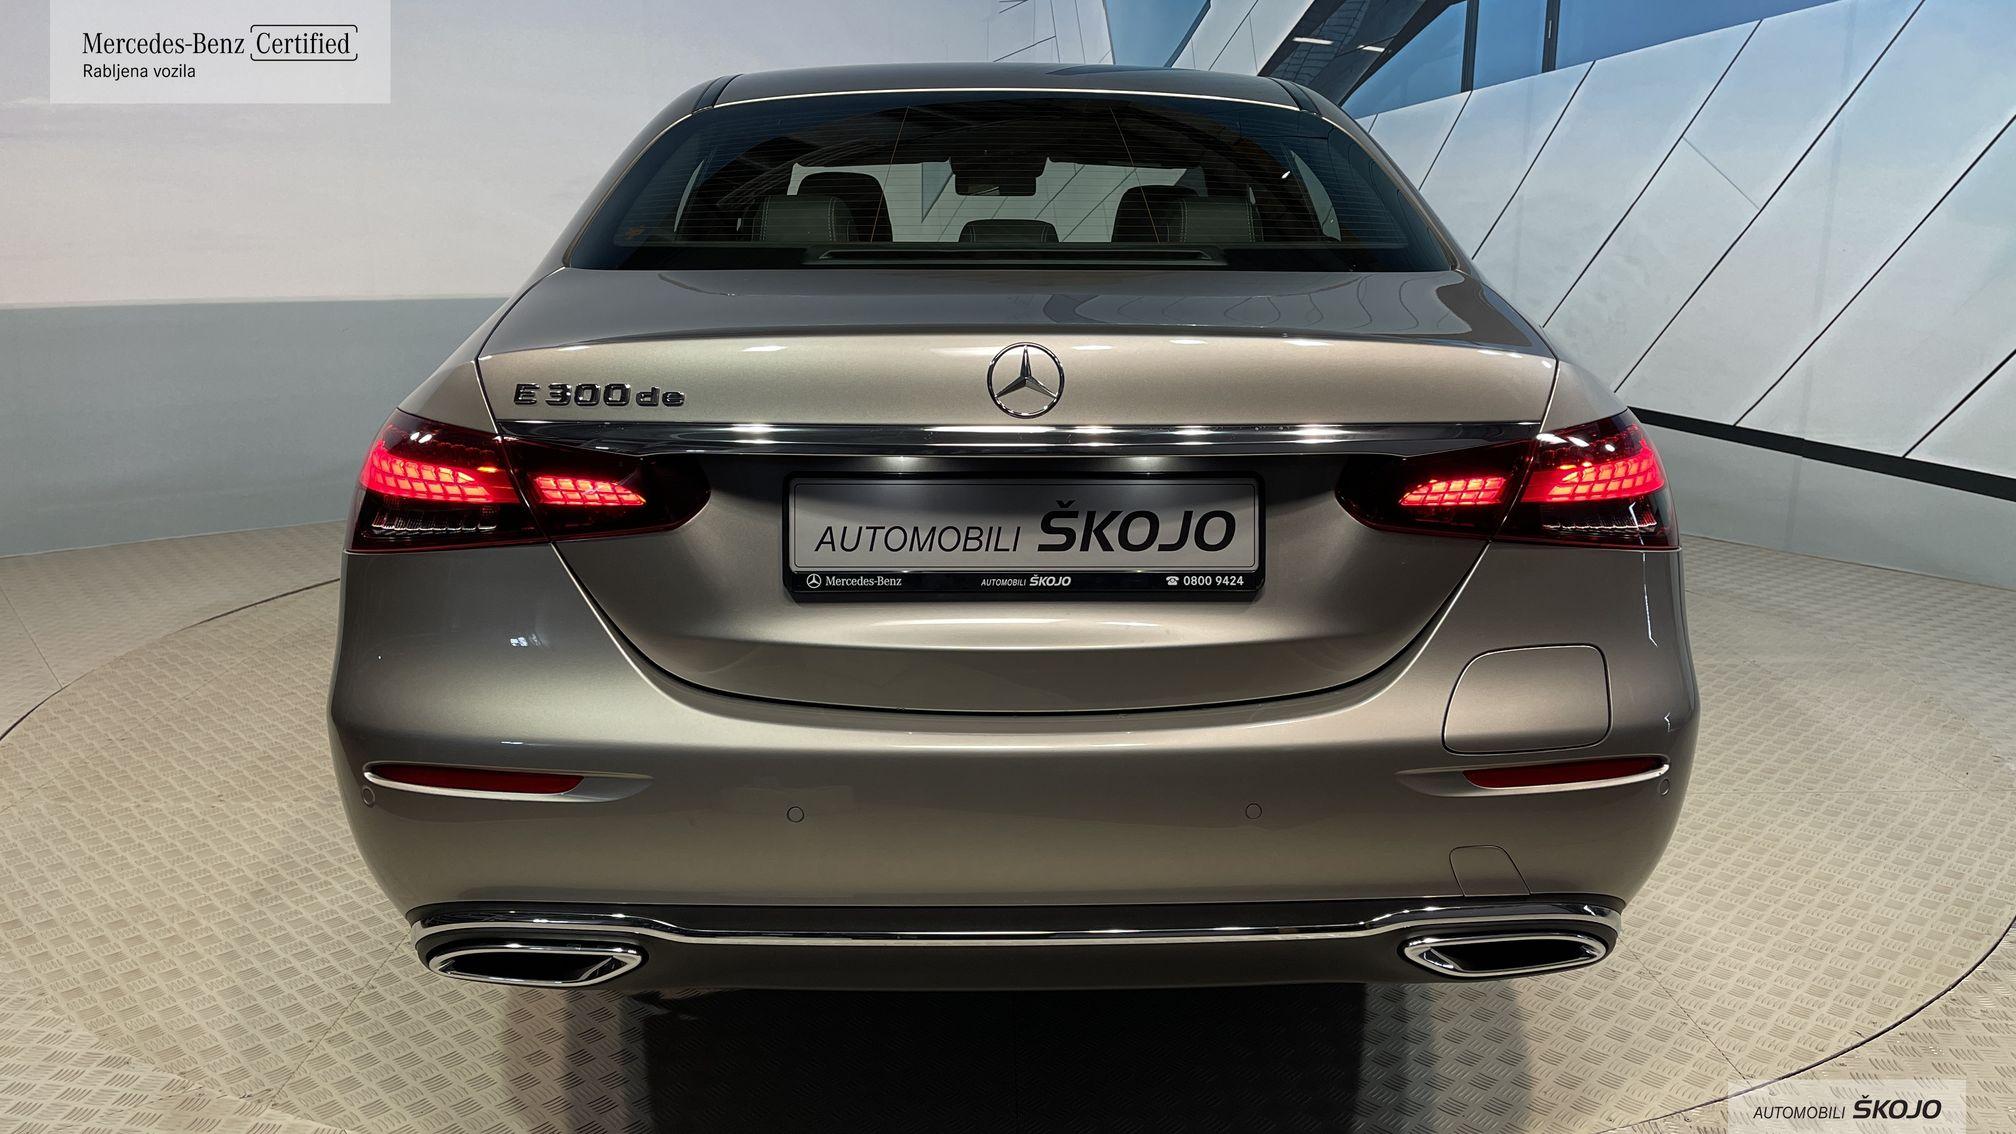 Mercedes-Benz_Škojo_9